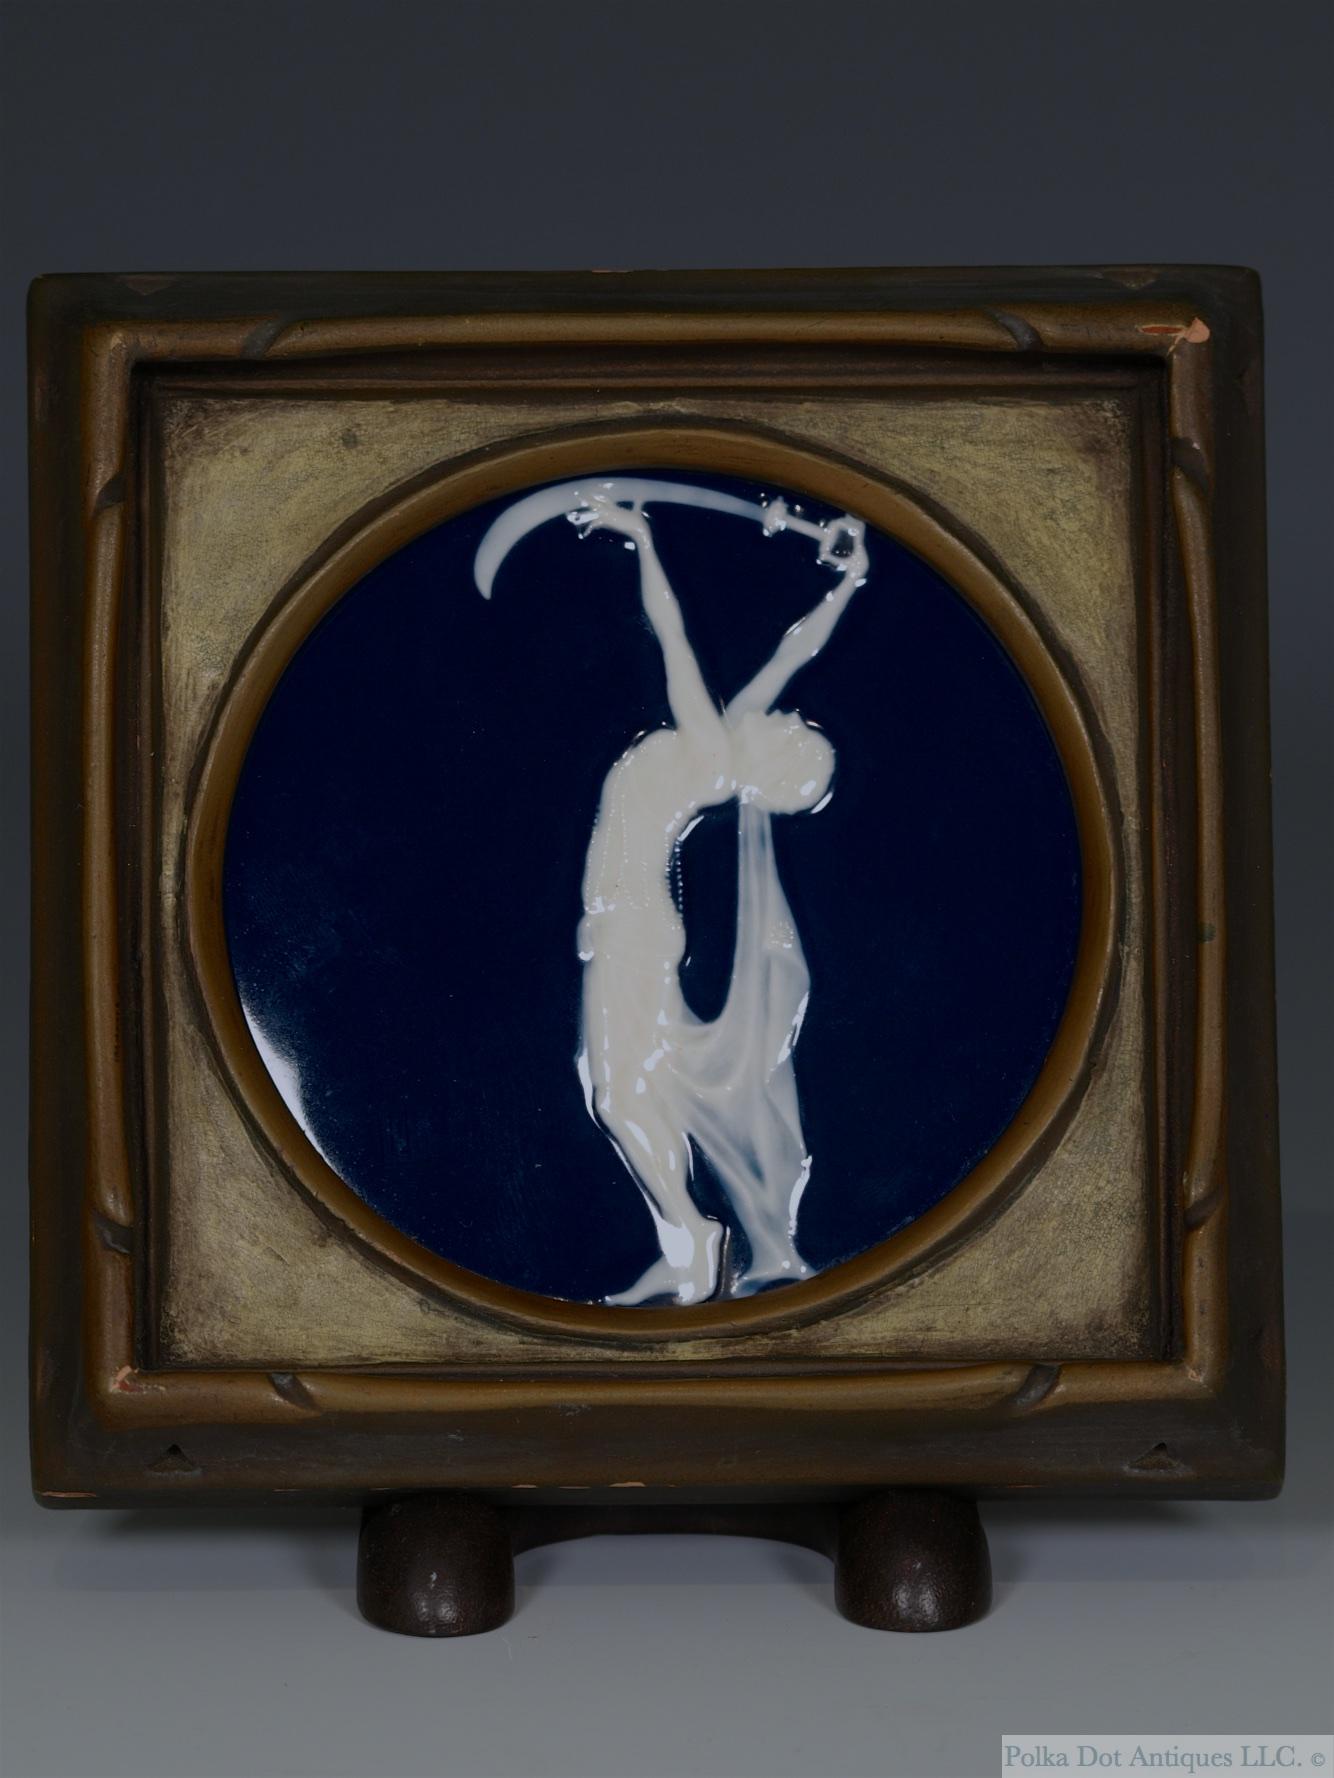 "Rare Lois Whitcomb Rhead Pâte-sur-pâte Framed Plaque 'The Scimeter', 1920-22, , 4"" diam."